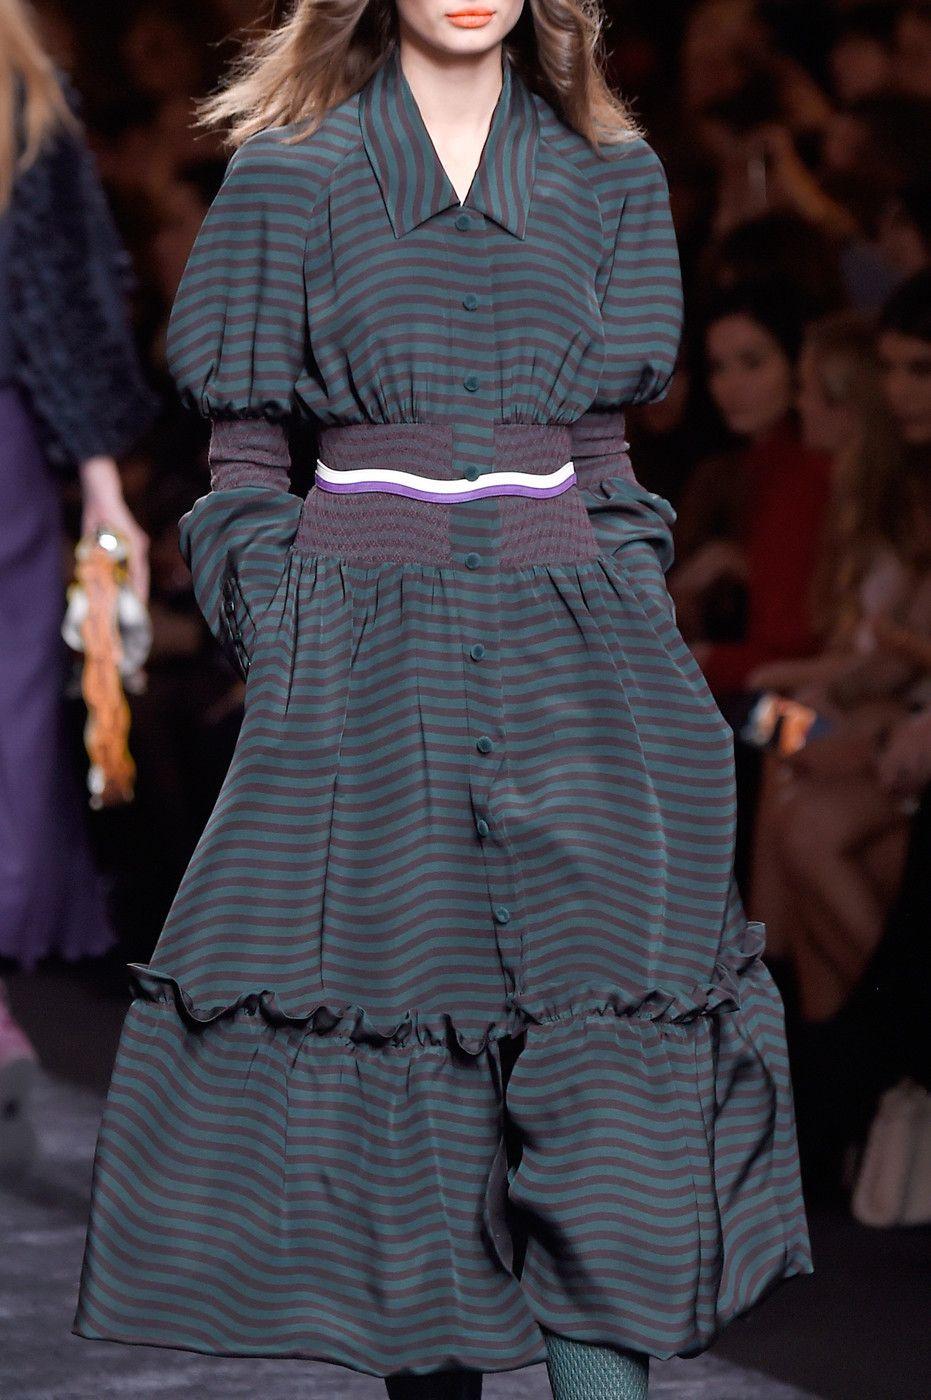 dd284f8326f5e9 Fendi Fall 2016 Ready-to-Wear by Silvia Venturini Fendi and Karl Lagerfeld